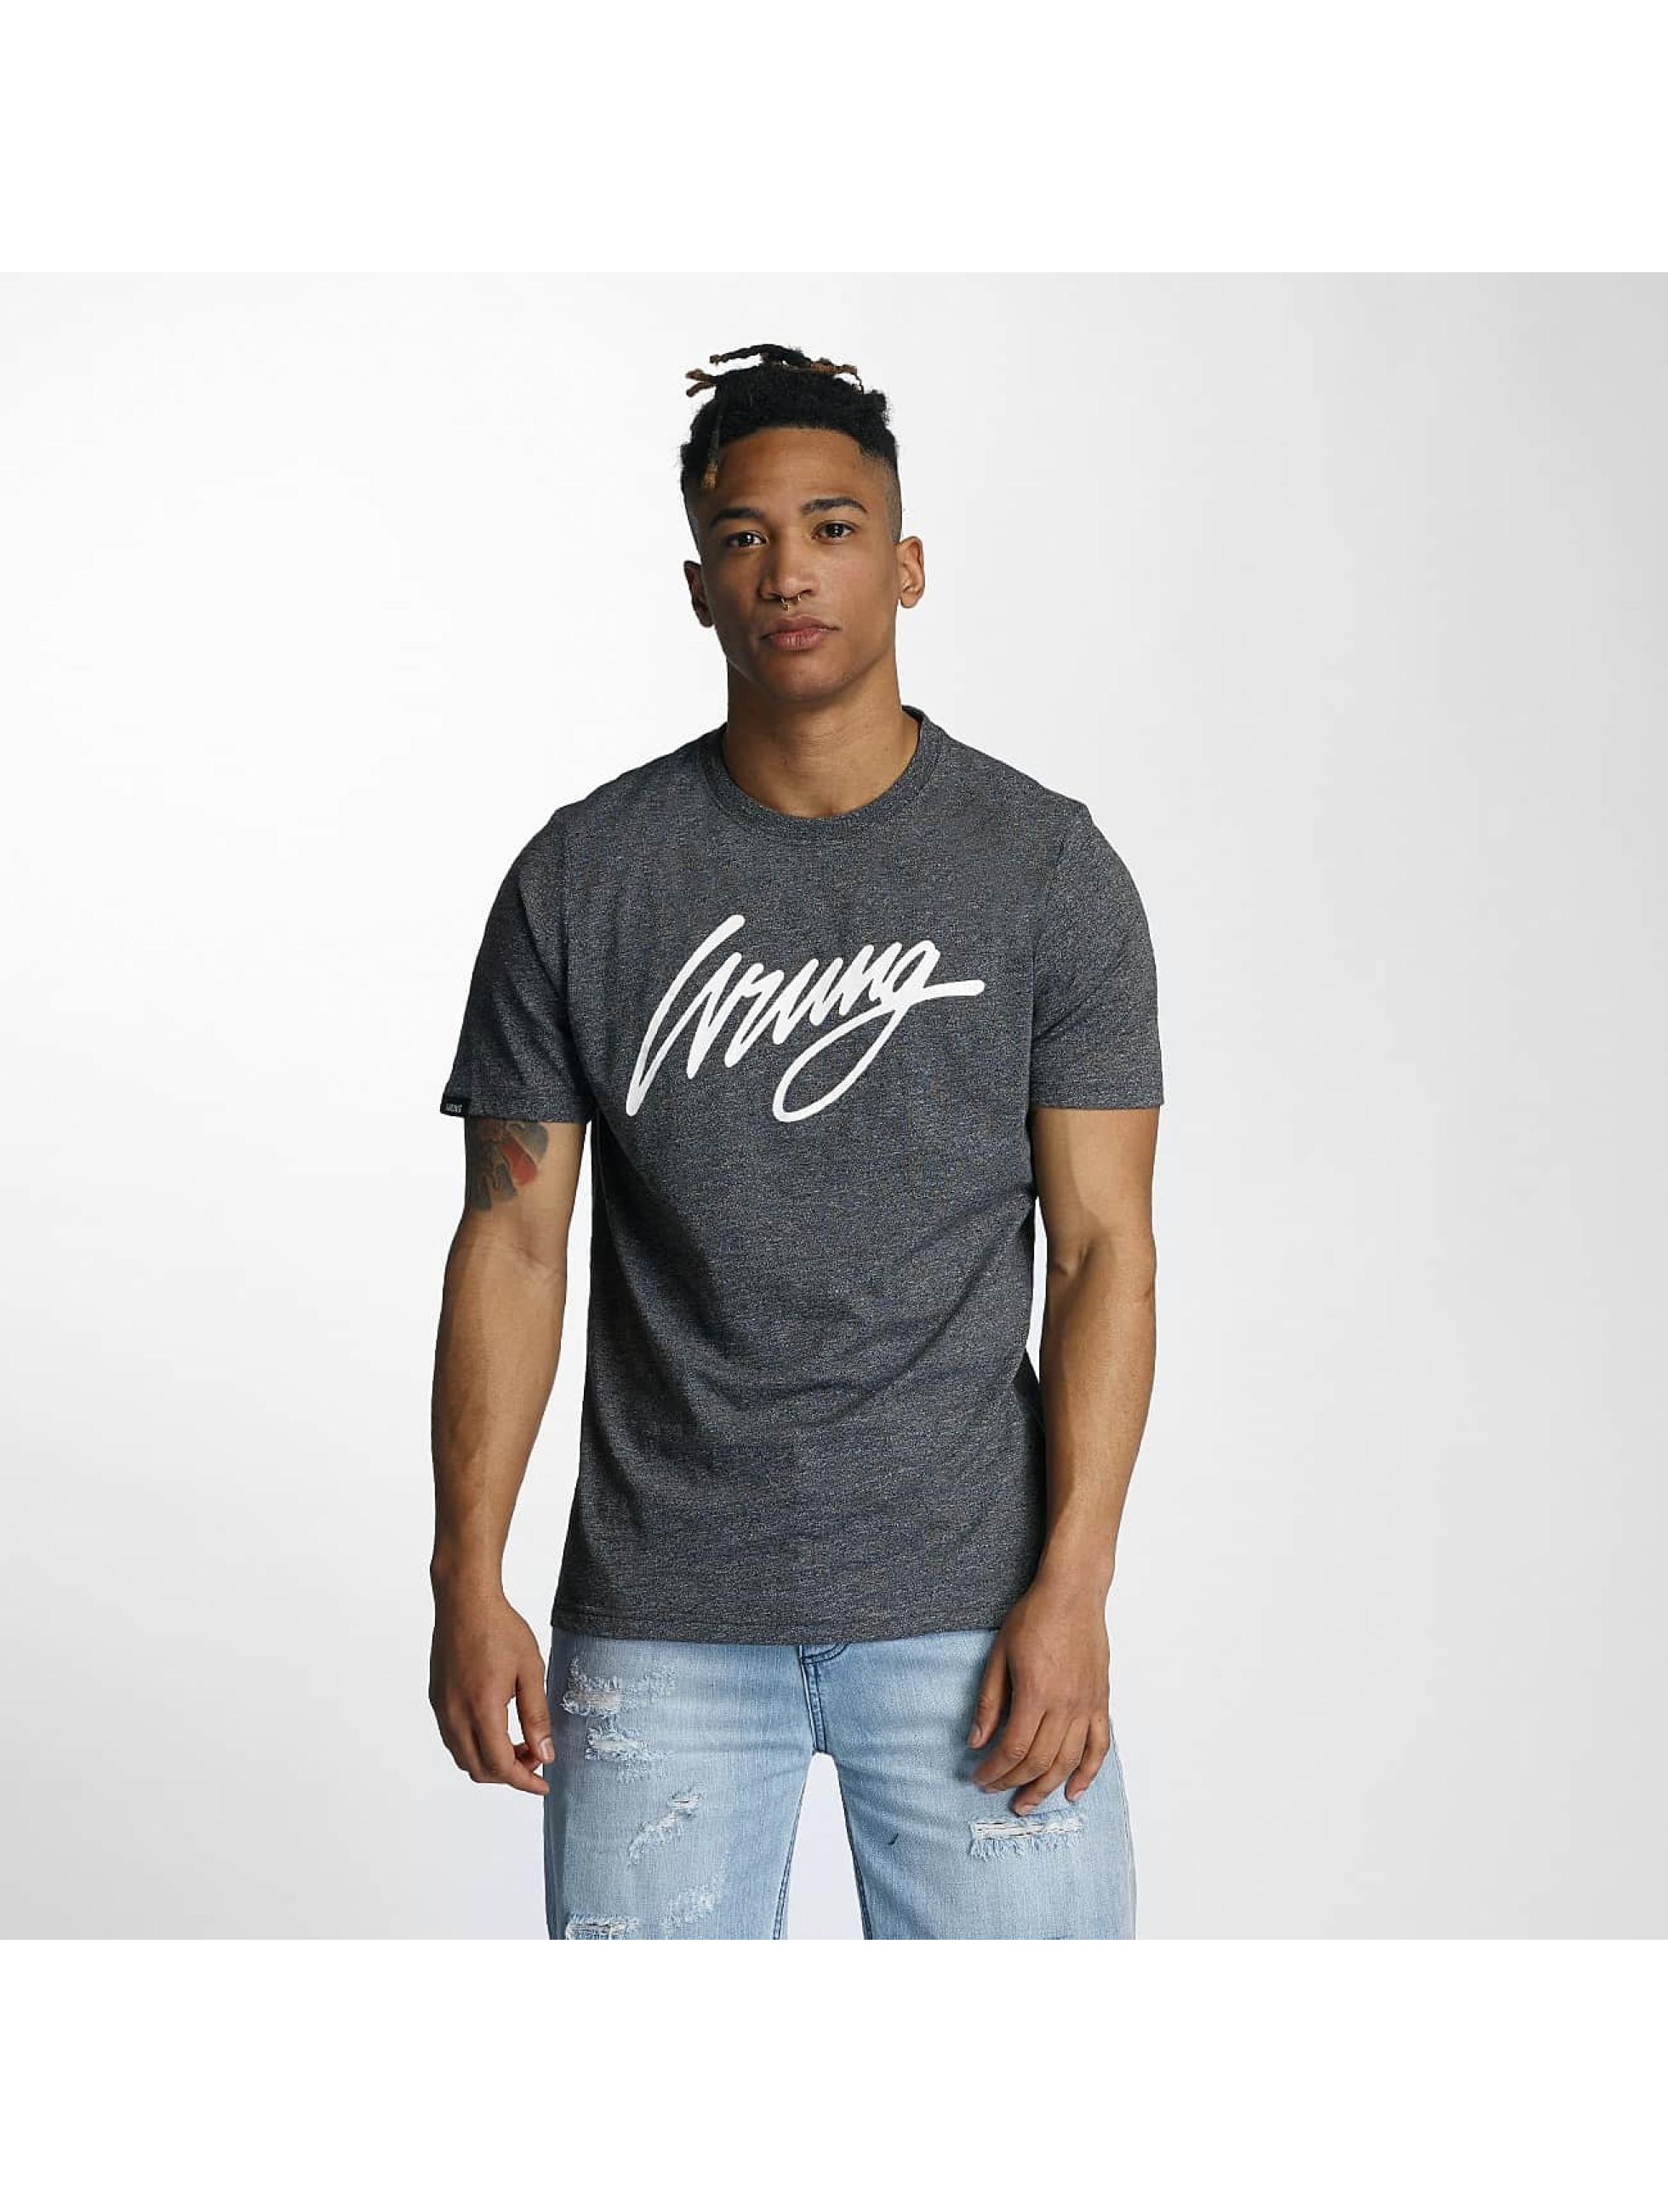 Wrung Division T-Shirt Signature black